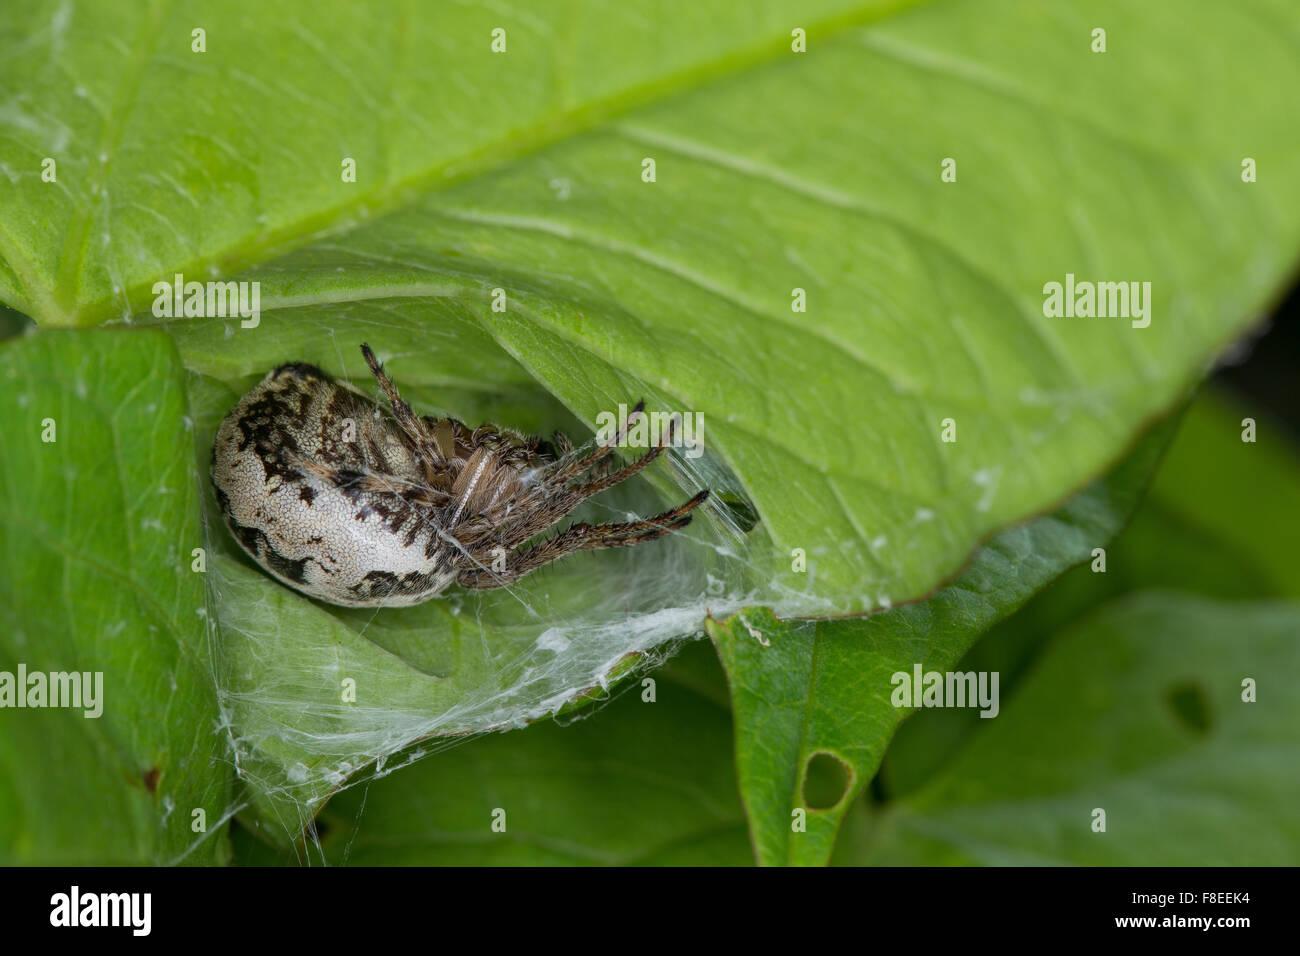 Furrow spider, Furrow Orbweaver Spider, Schilfradspinne, Schildkreuzspinne, Larinioides cornutus, Araneus cornutus Stock Photo